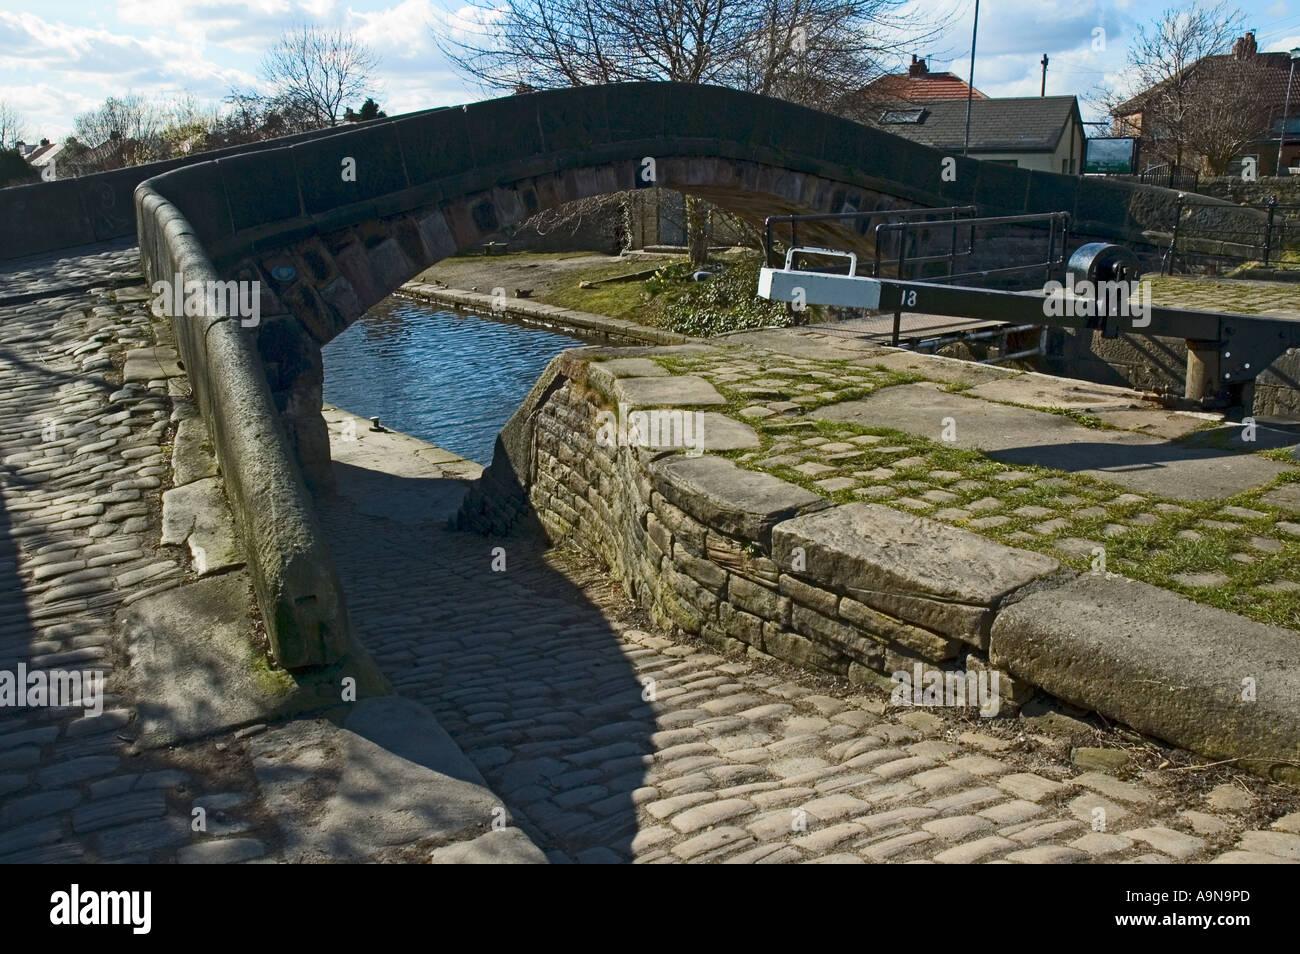 Footbridge at Fairfield Locks, on the Ashton Canal at Droylsden, Tameside, Manchester, England, UK - Stock Image